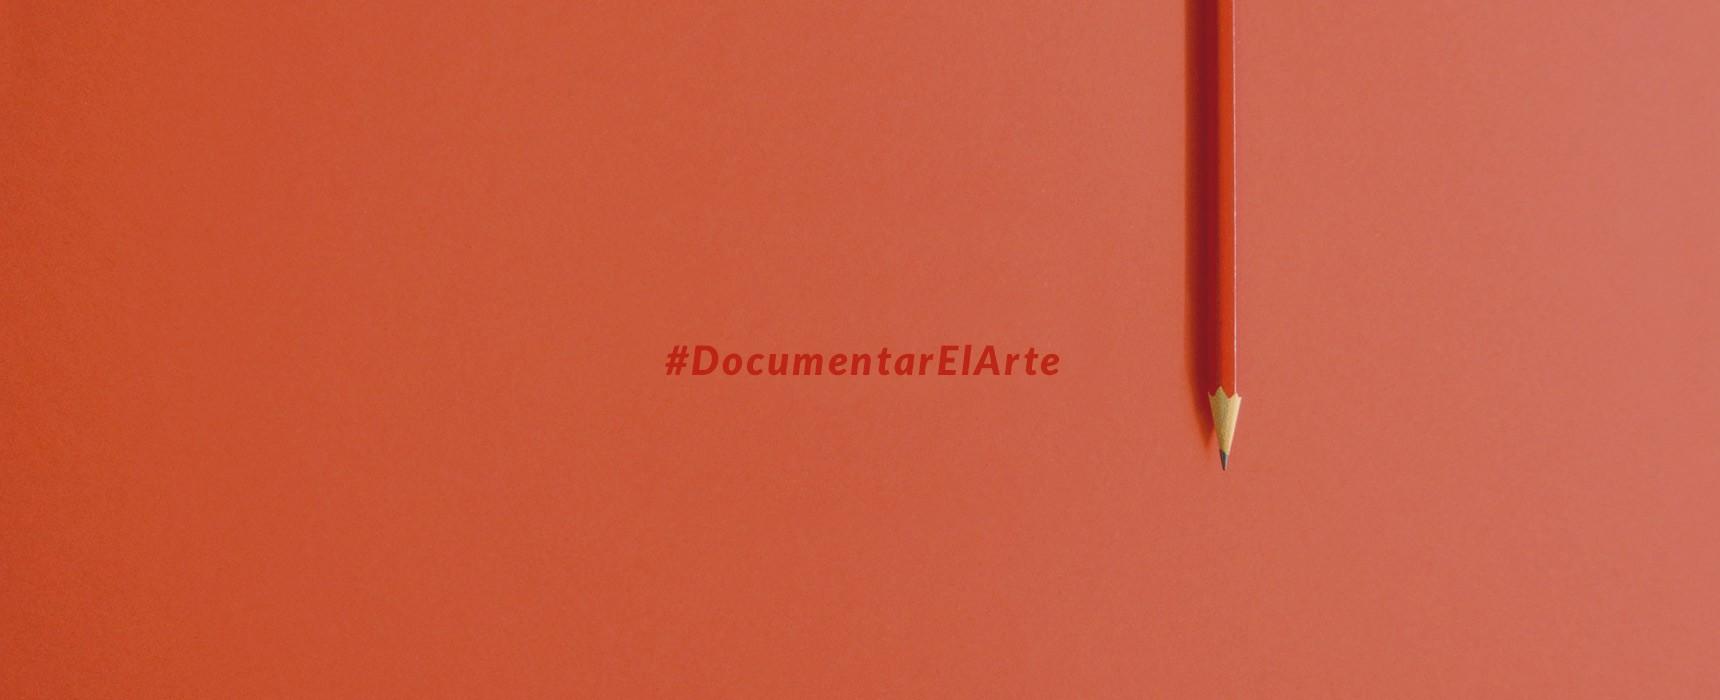 #DocumentarElArte